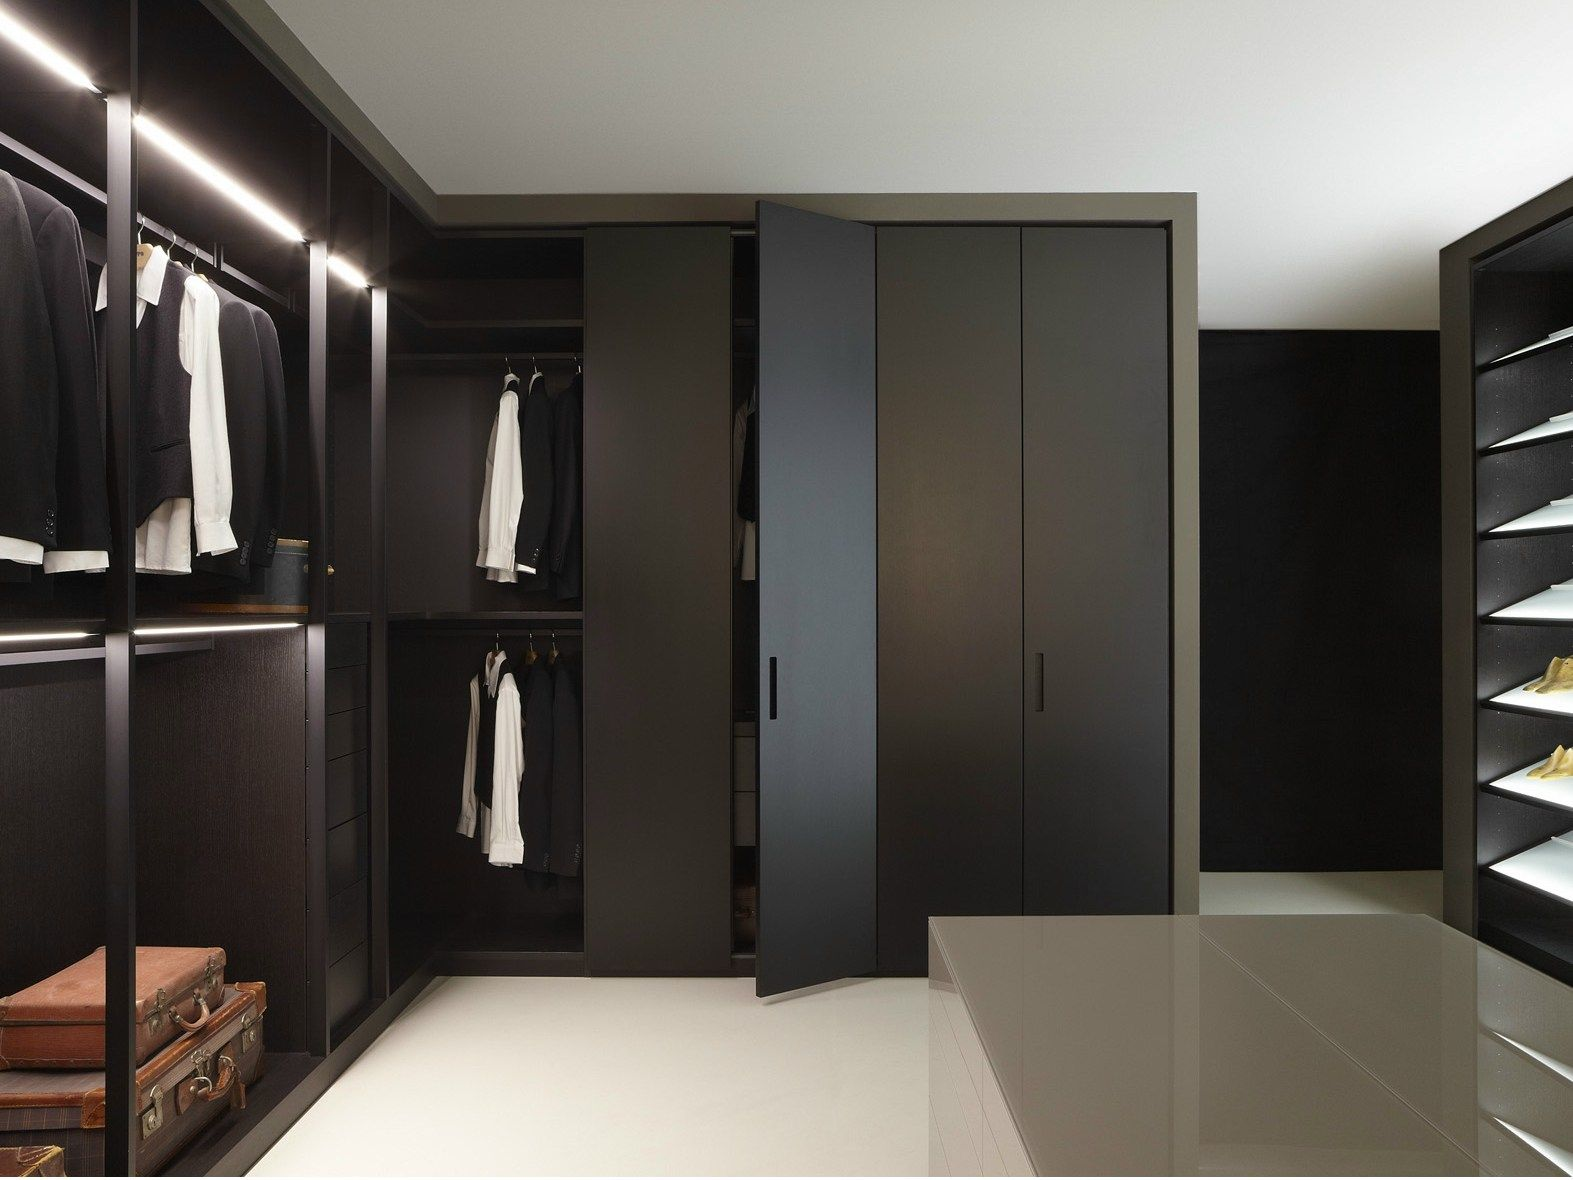 Awesome Kleiderschrank Design Reference Of Walk-in Wardrobe Storage Storage Collection By Porro